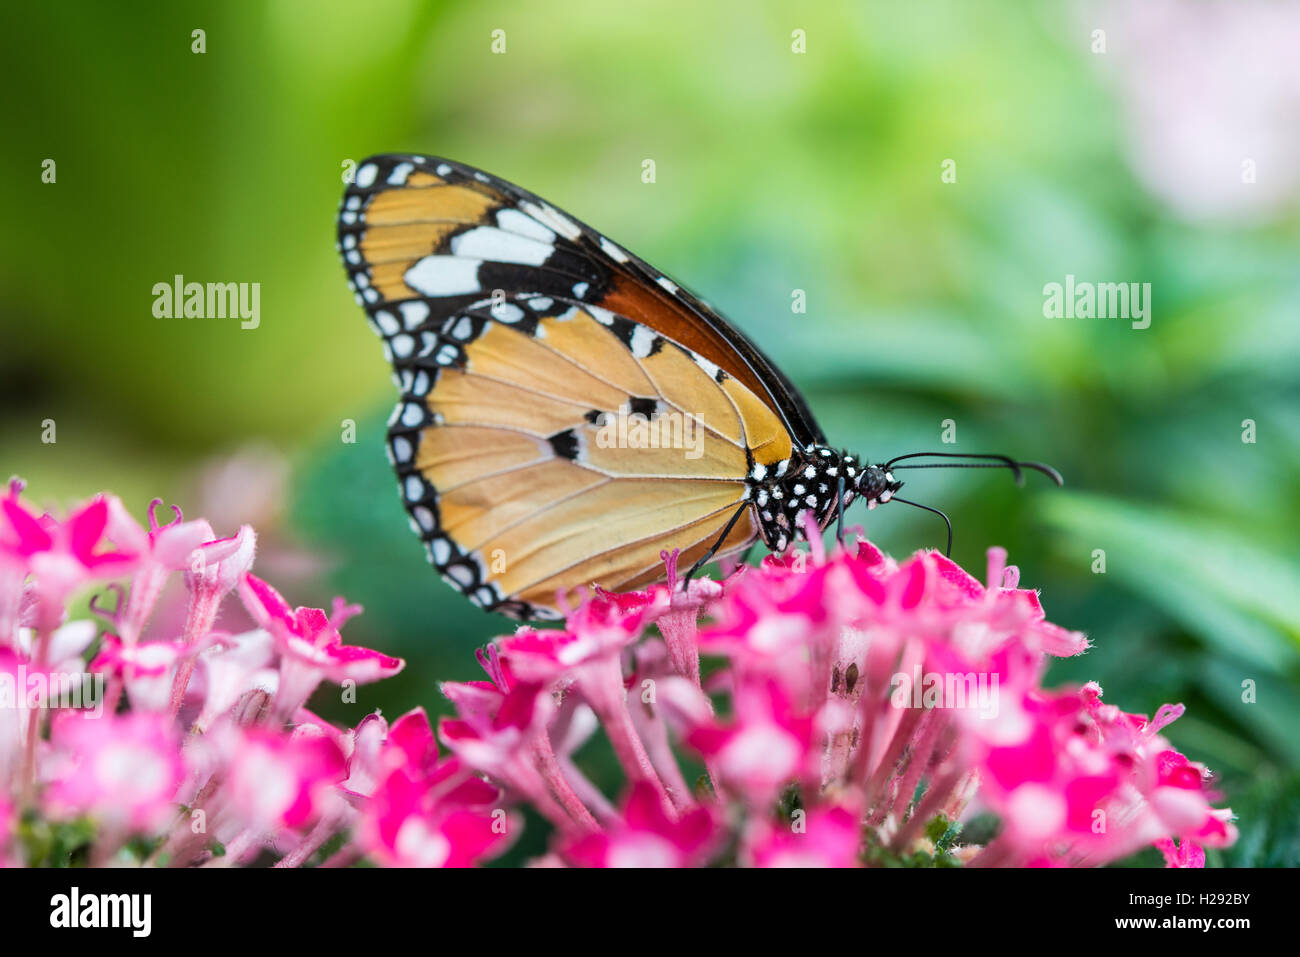 Mariposa monarca (Danaus plexippus) sobre la flor rosa, cautiva Imagen De Stock